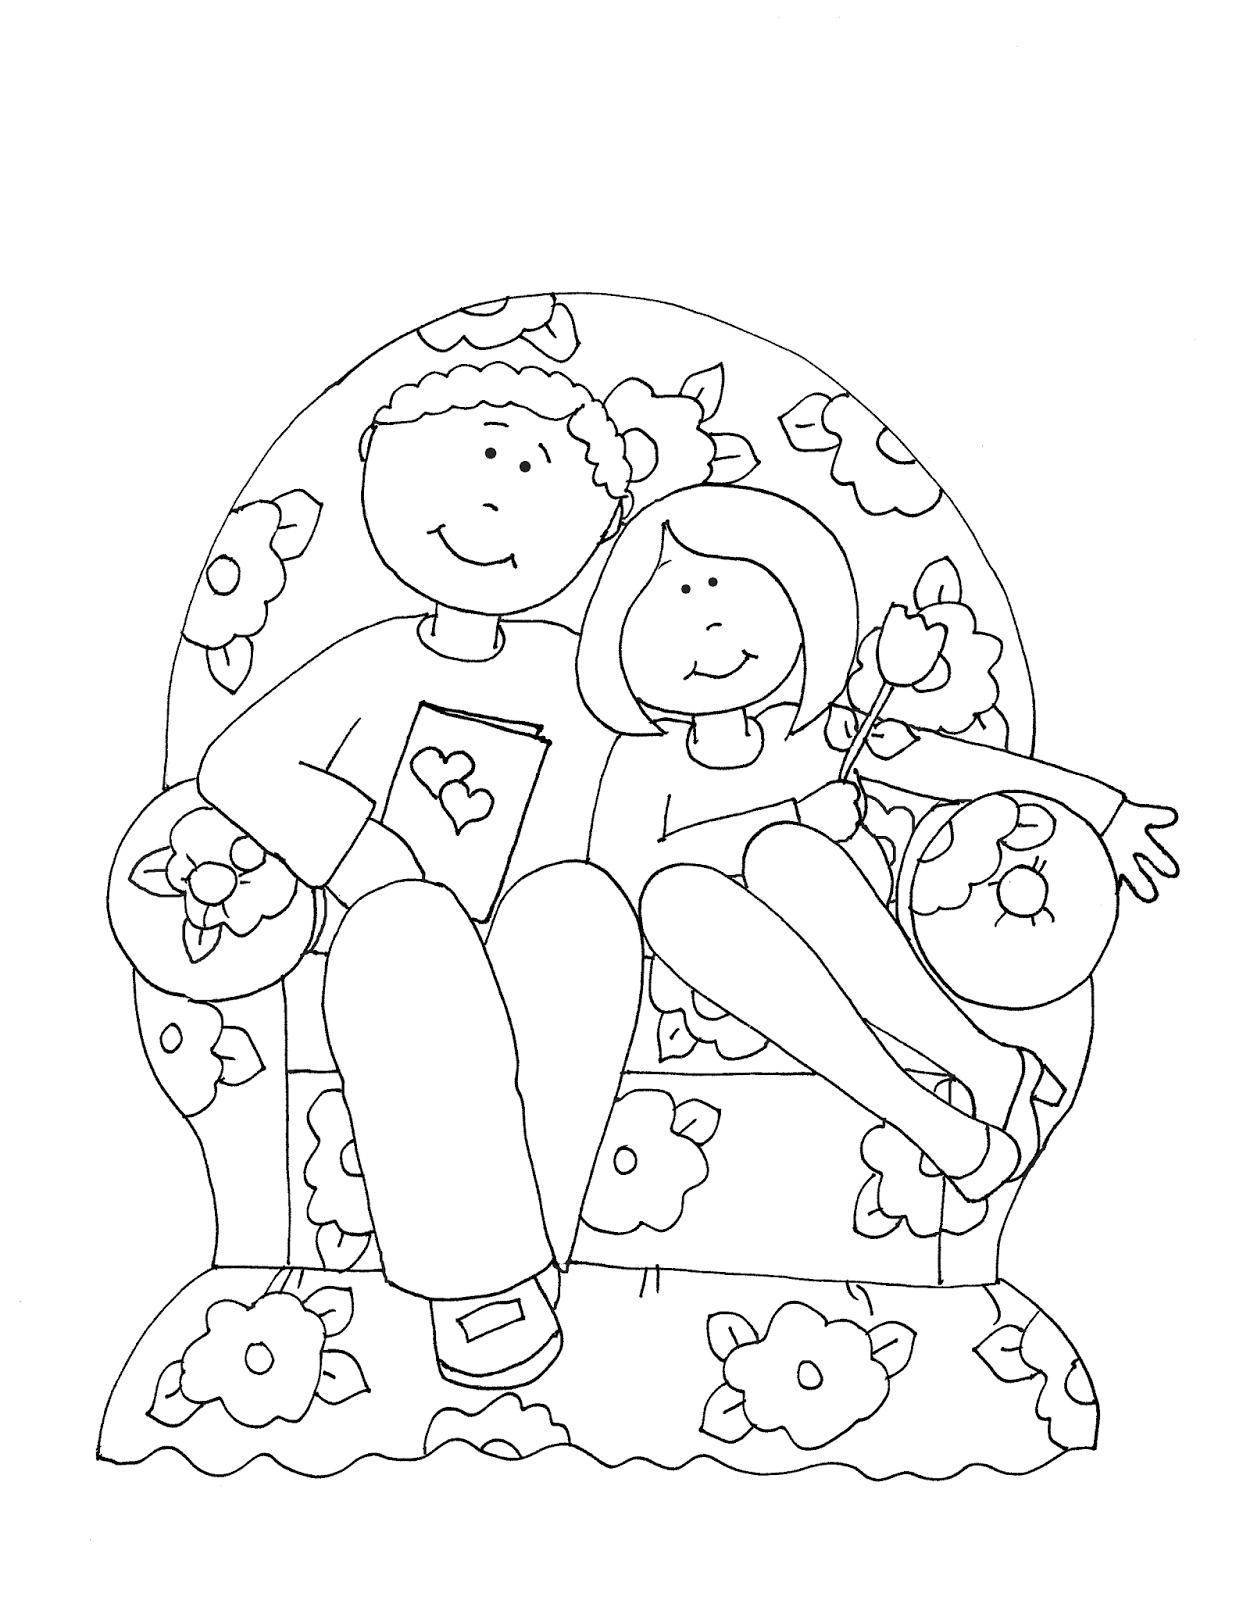 Coloring Pages Disney Lol : Coloring pages disney lol best free